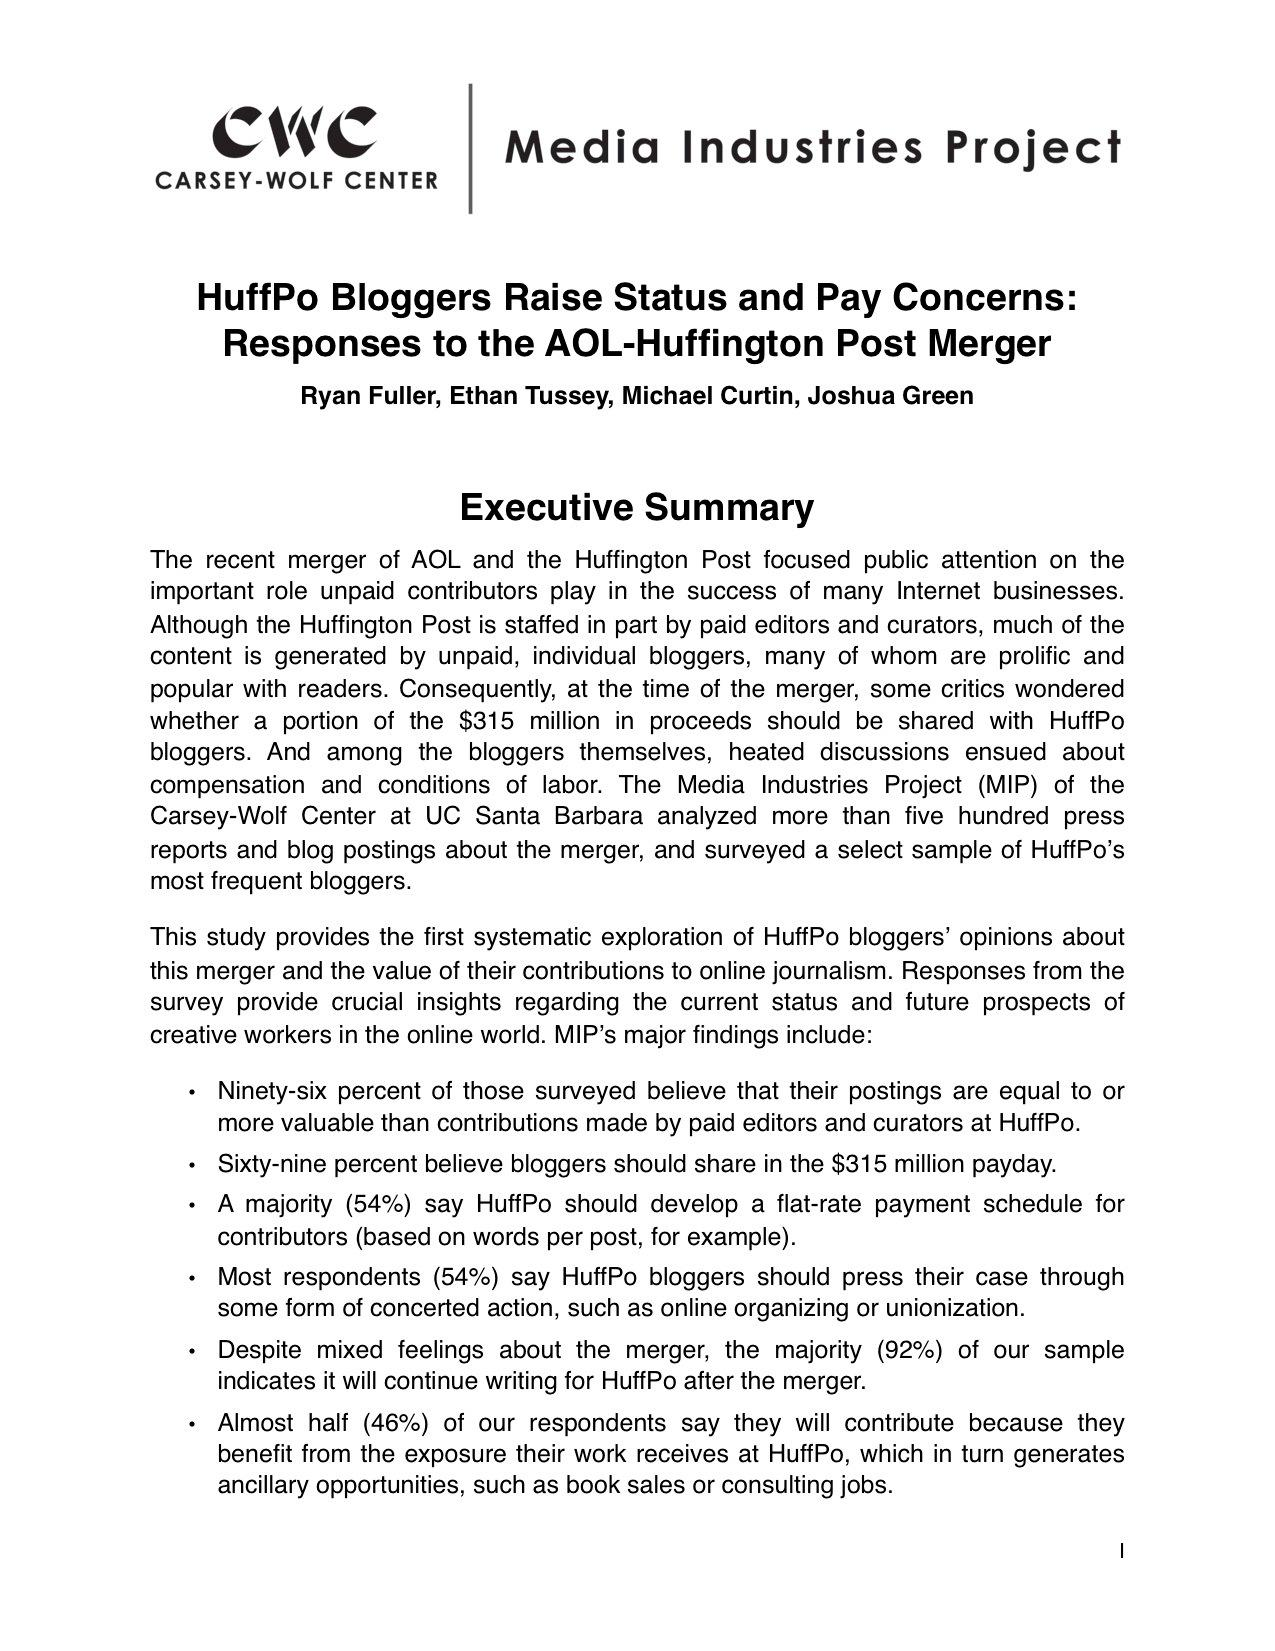 Executive Summary Apa Format 6th Edition Example